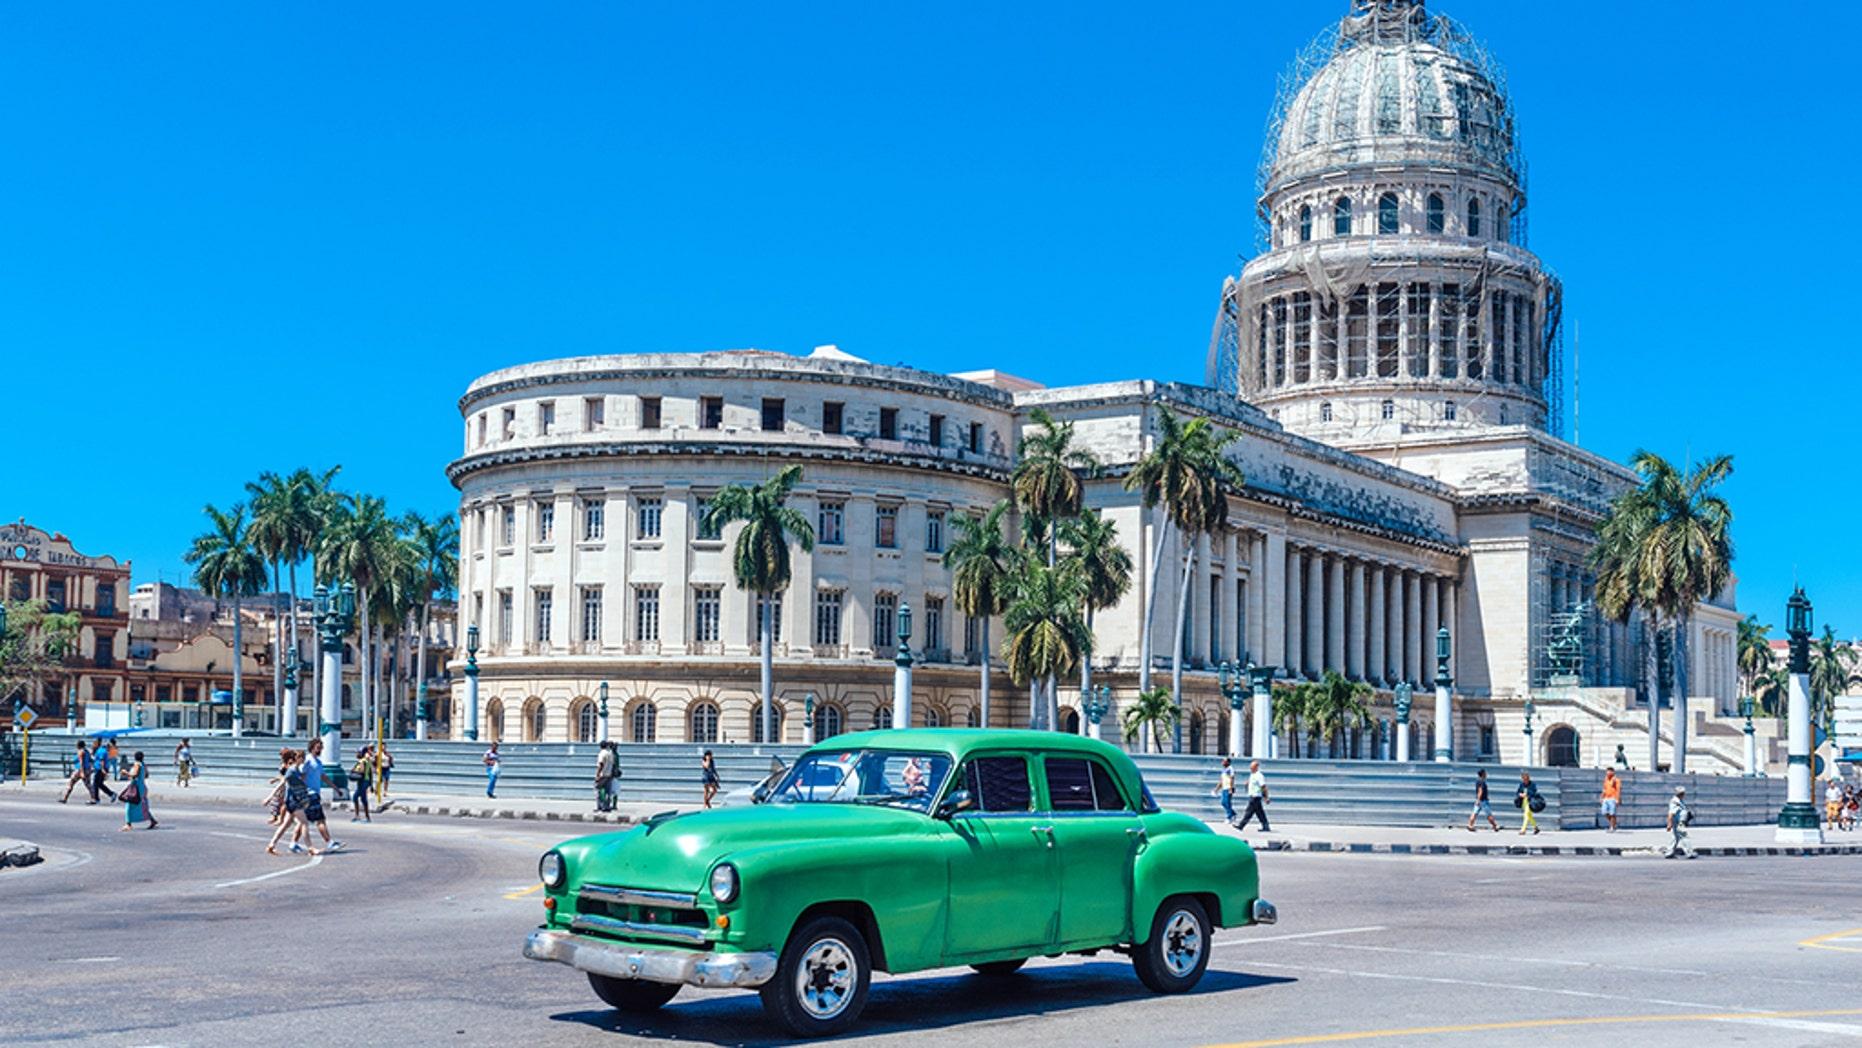 Cuba's Capitol, or El Capitolio, in Havana.